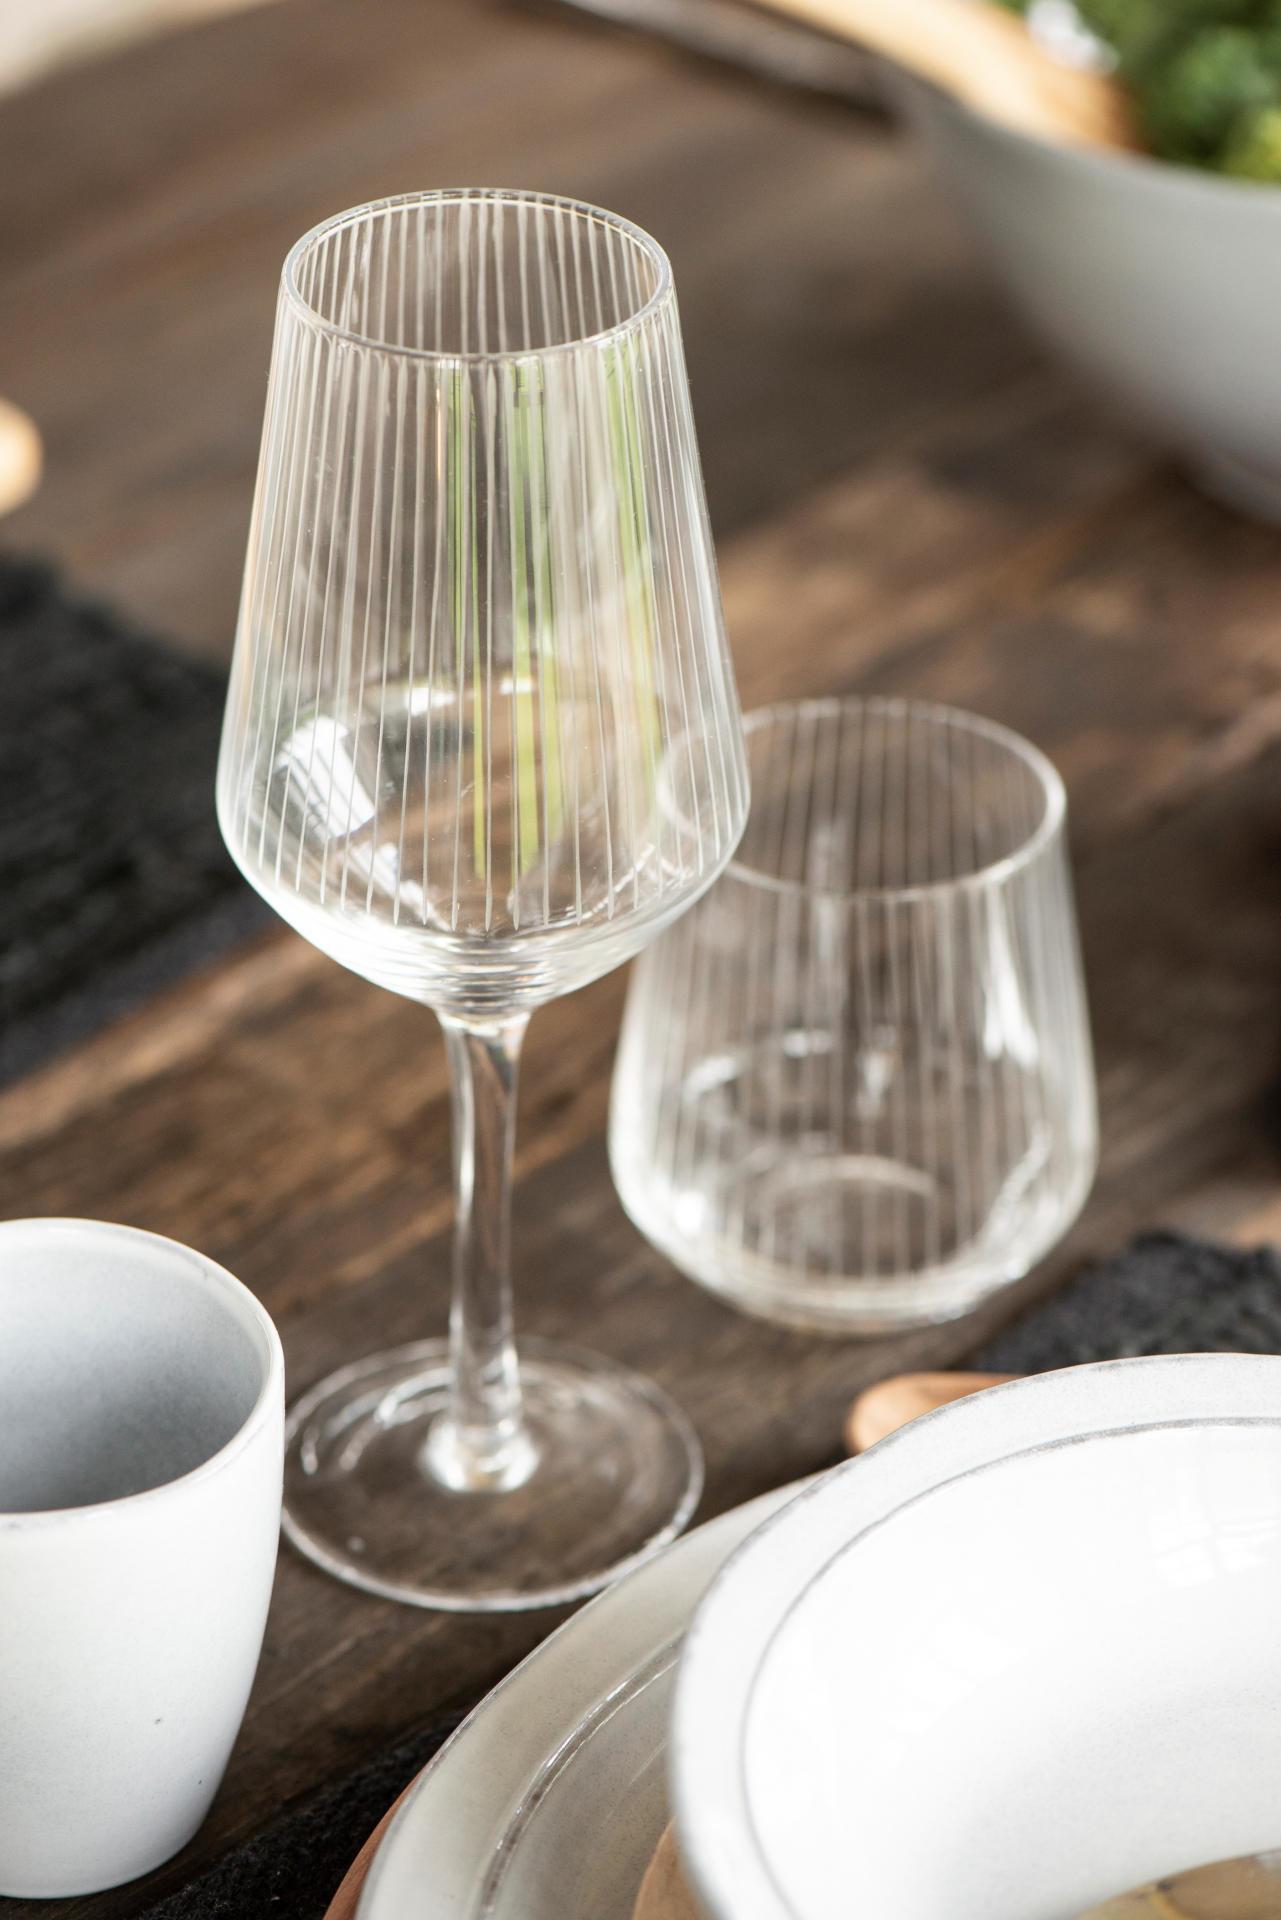 IB LAURSEN Sklenička na bílé víno Vega, čirá barva, sklo